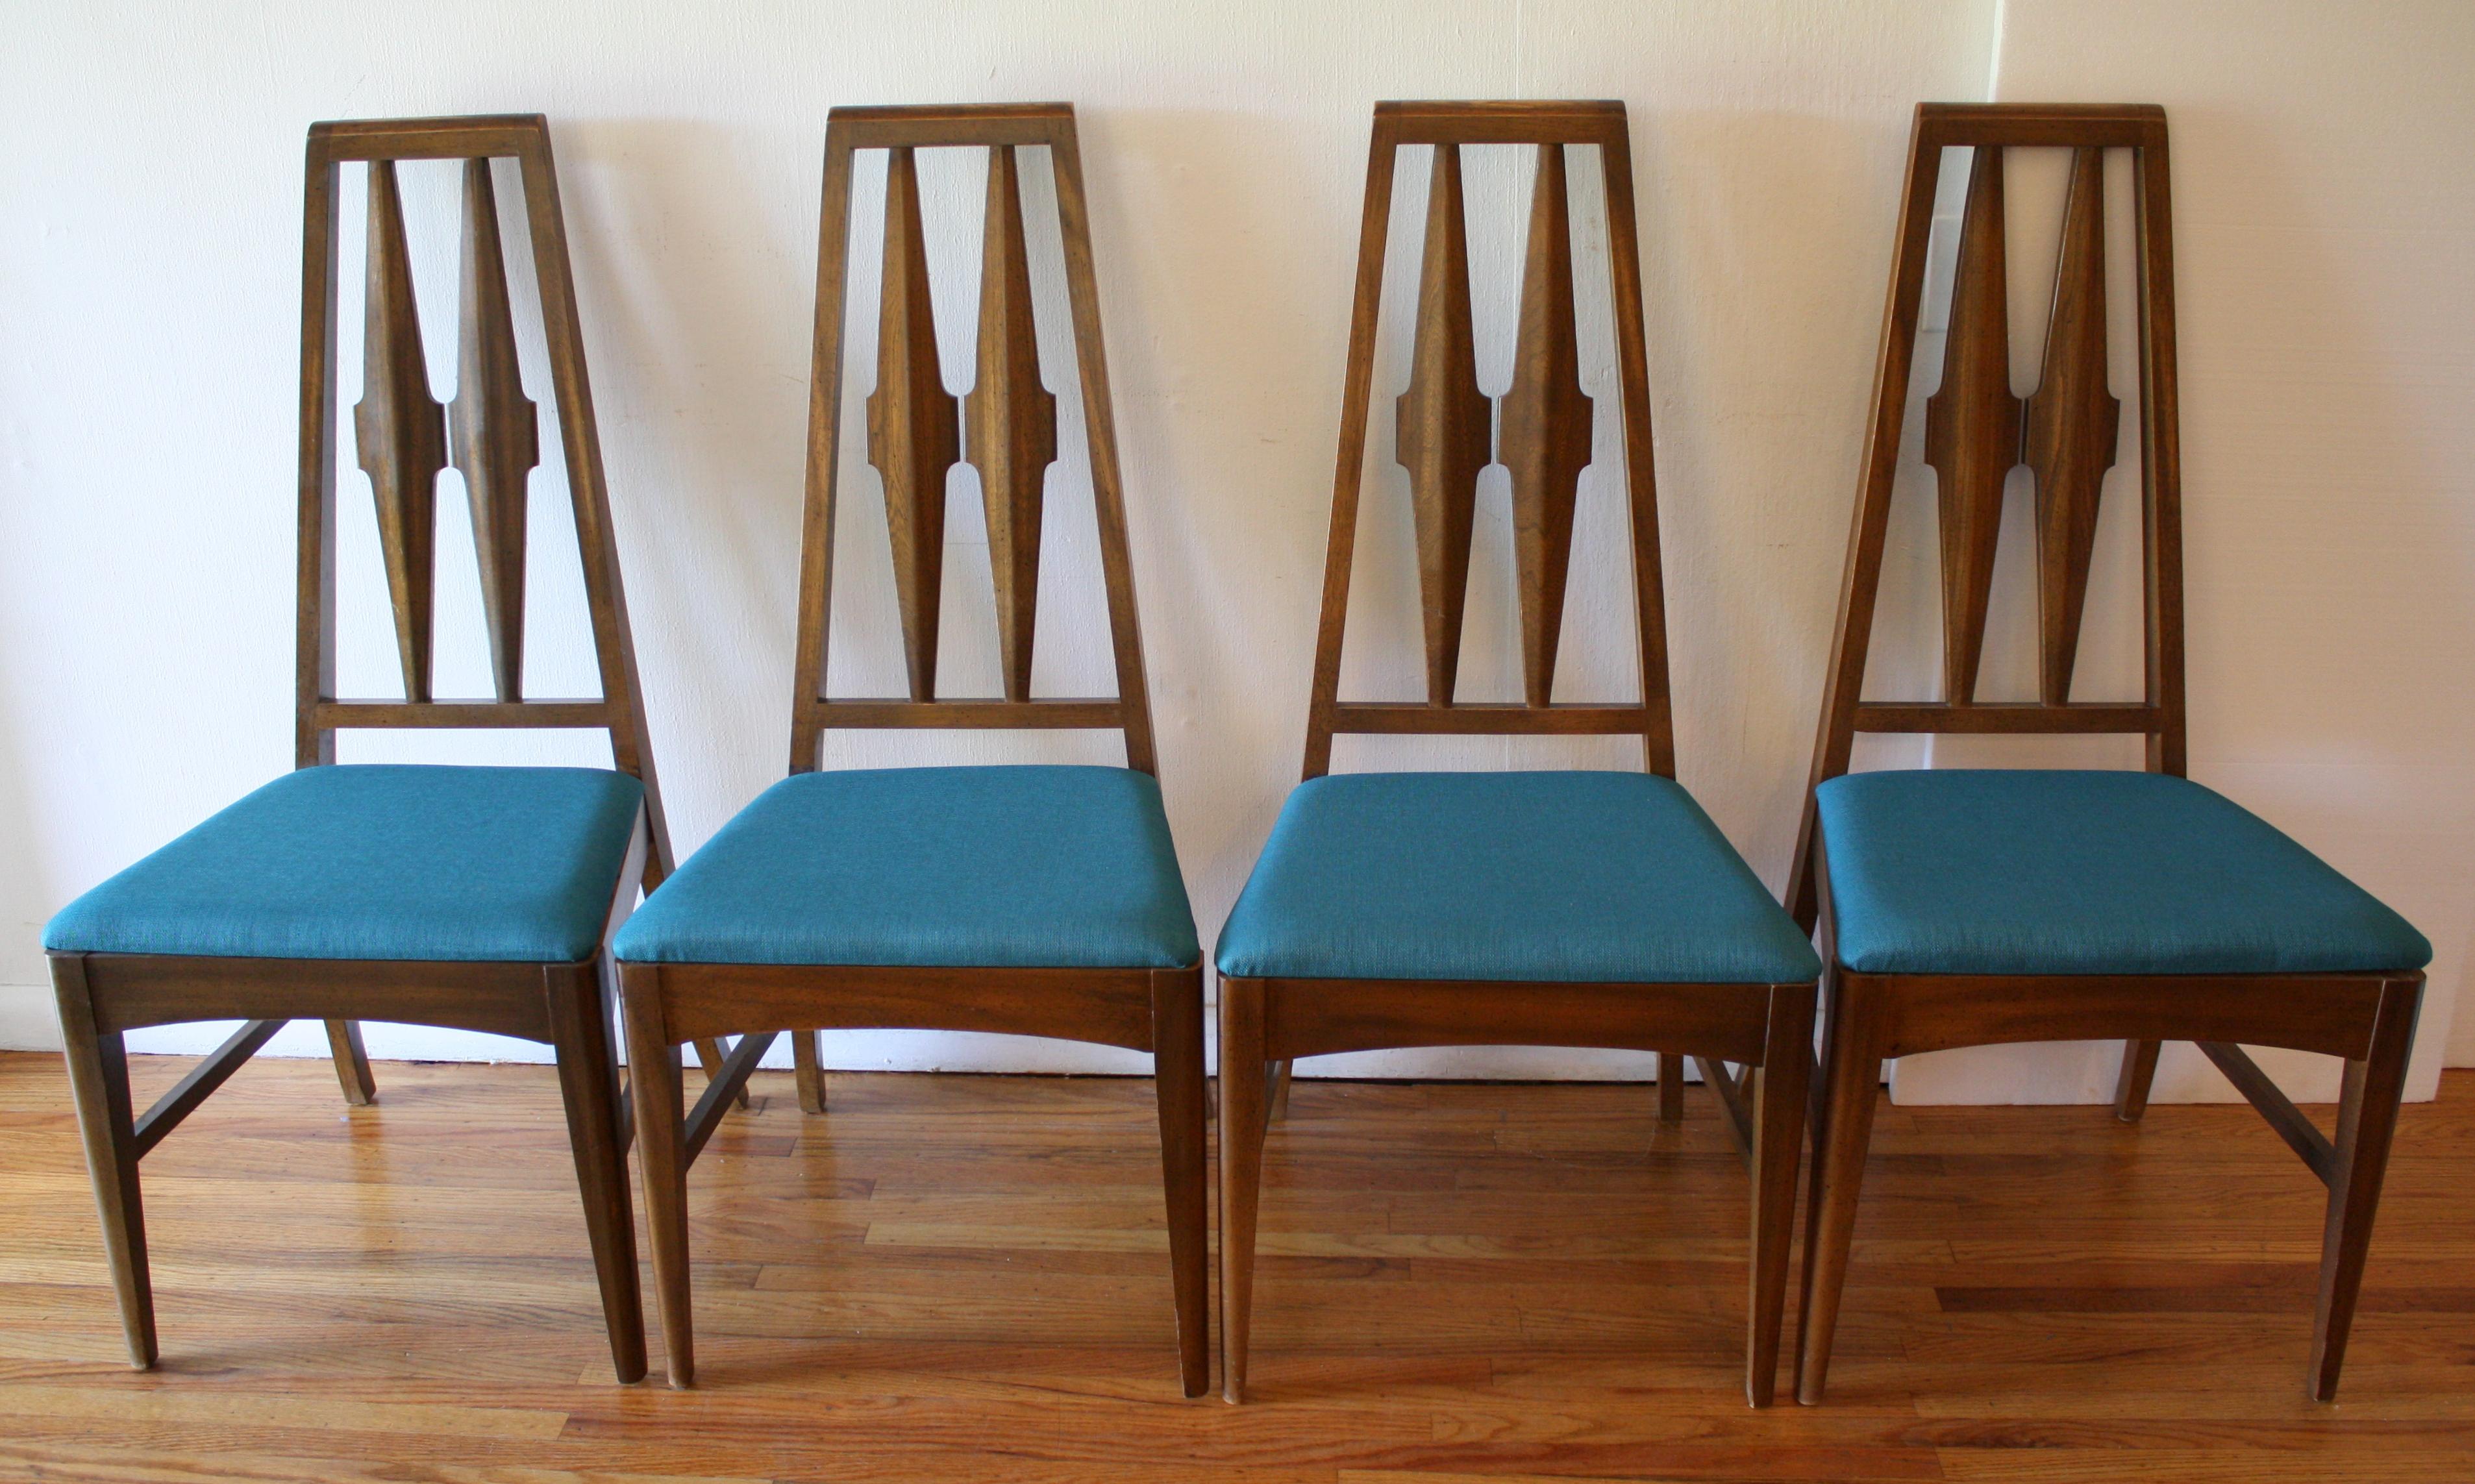 Broyhill Brasilia dining chair set of 4